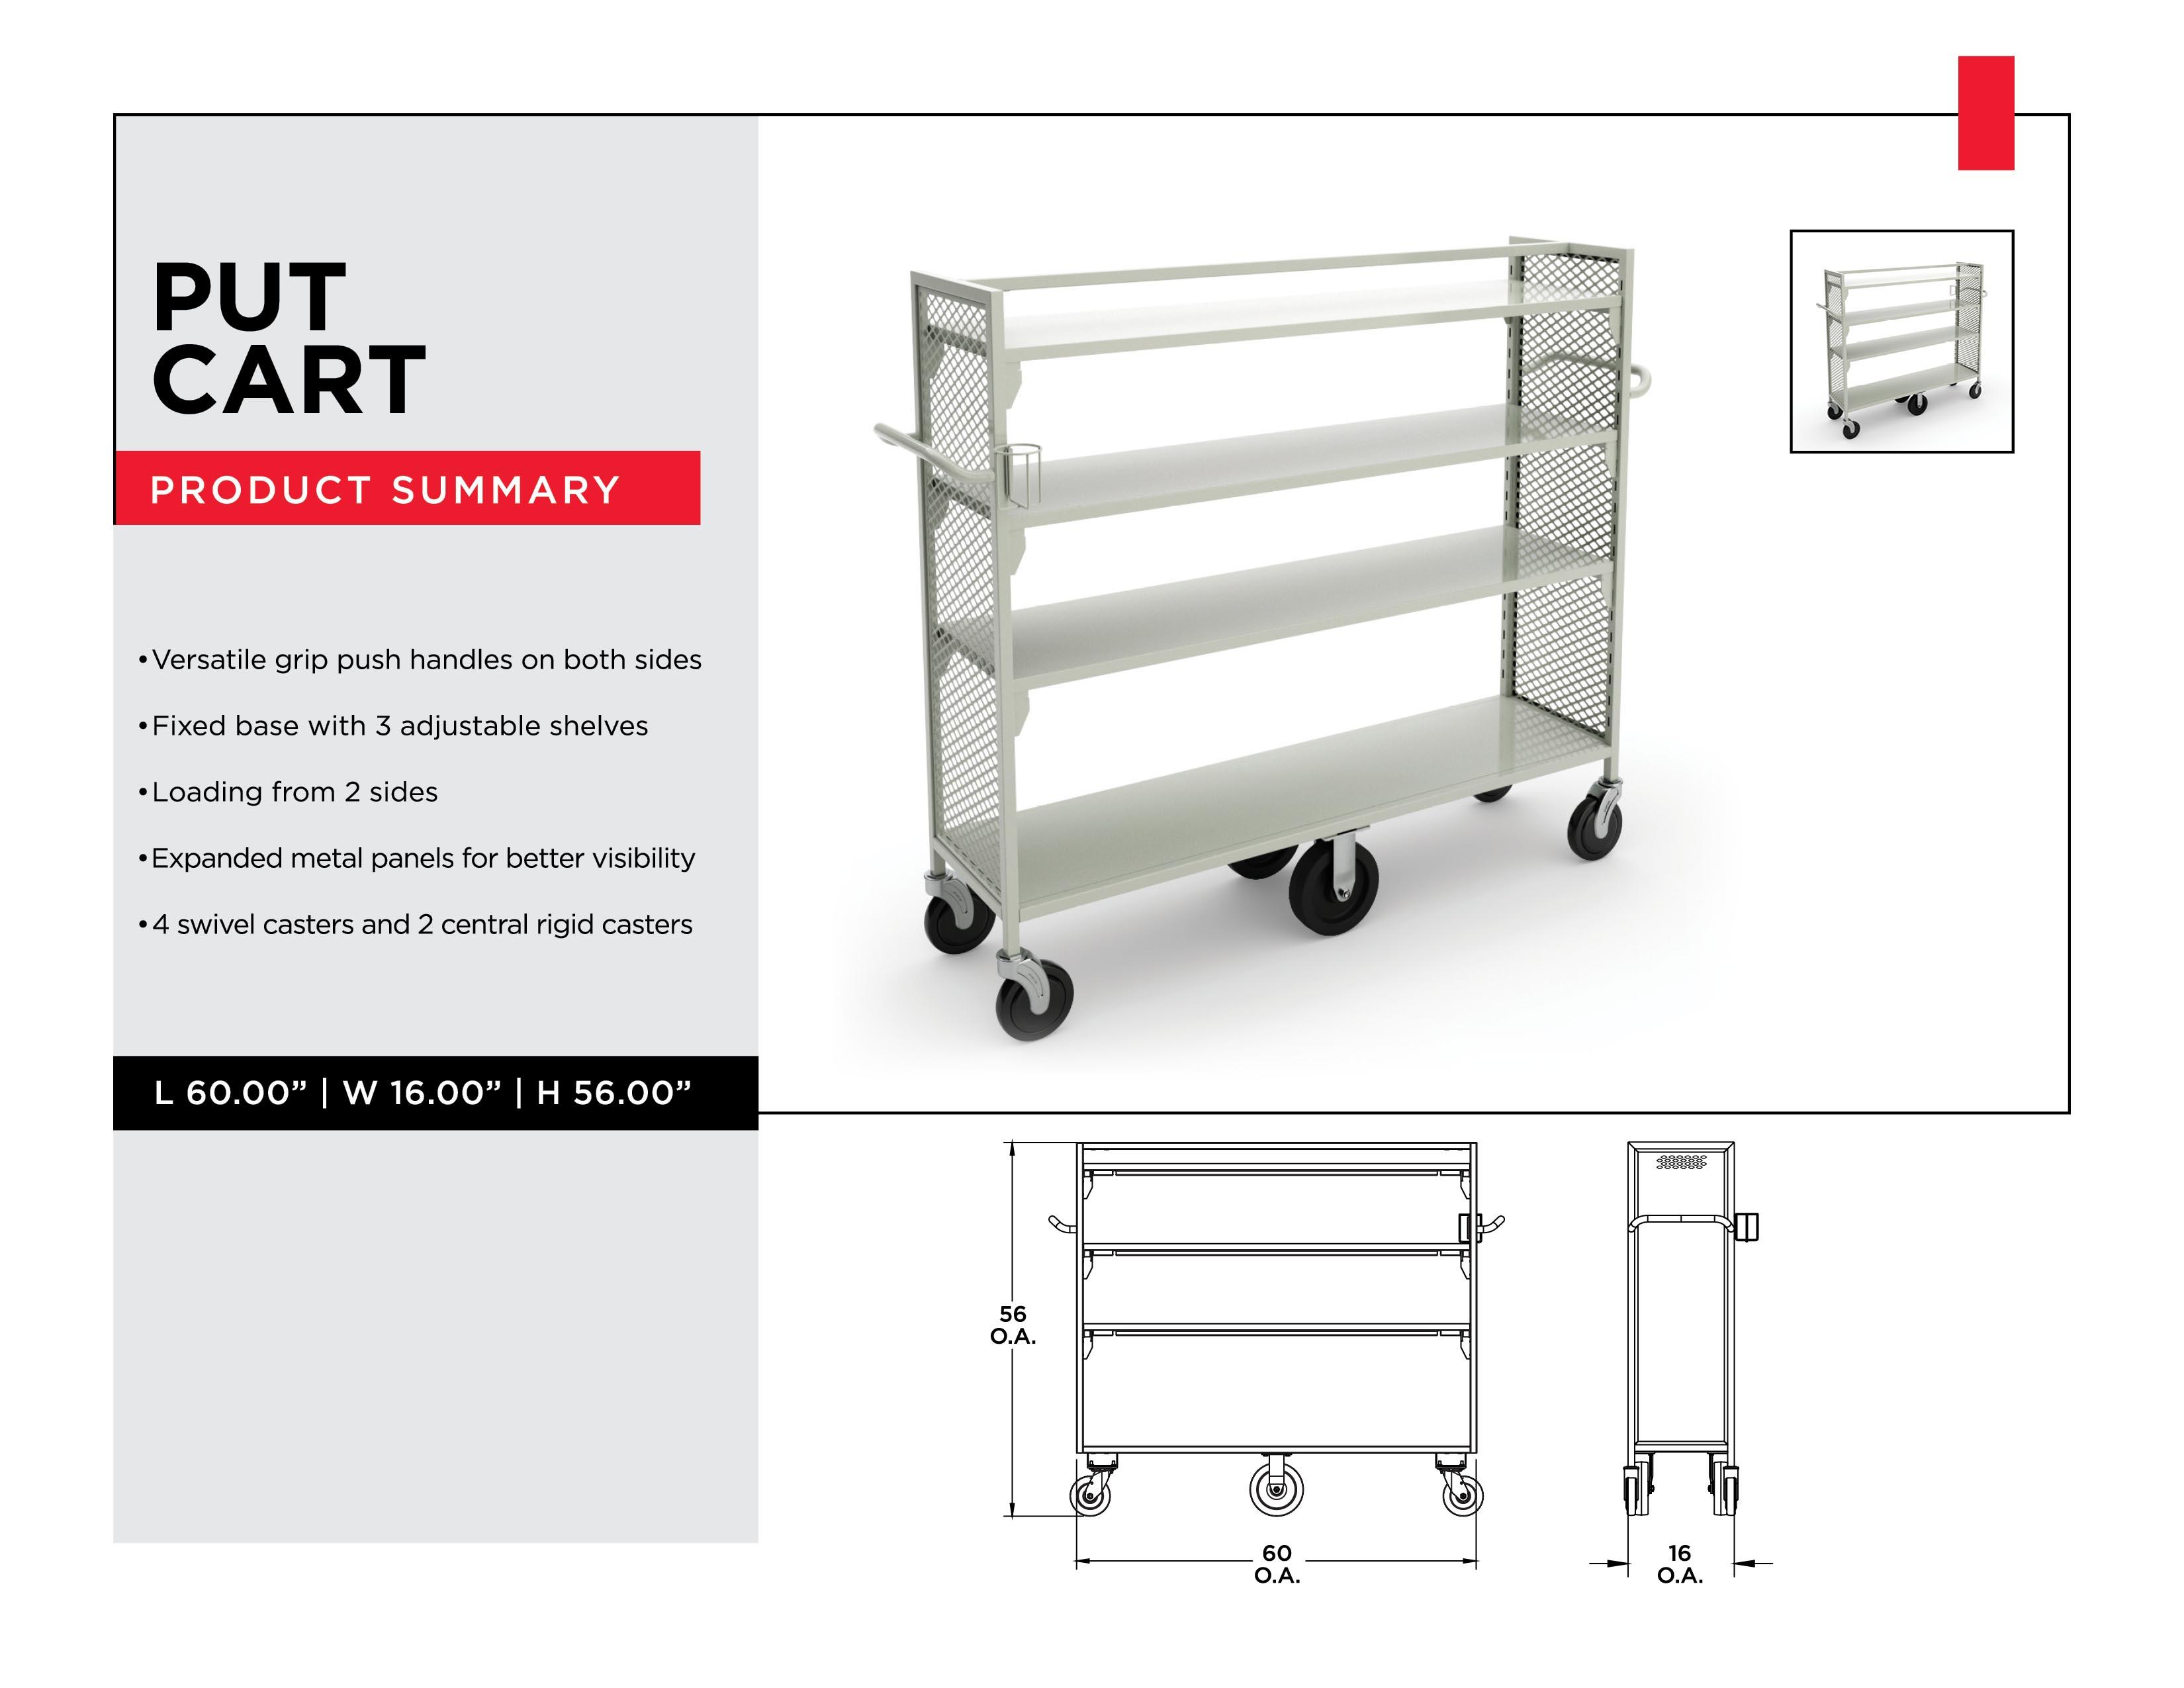 Retail Inventory Management: Put Cart